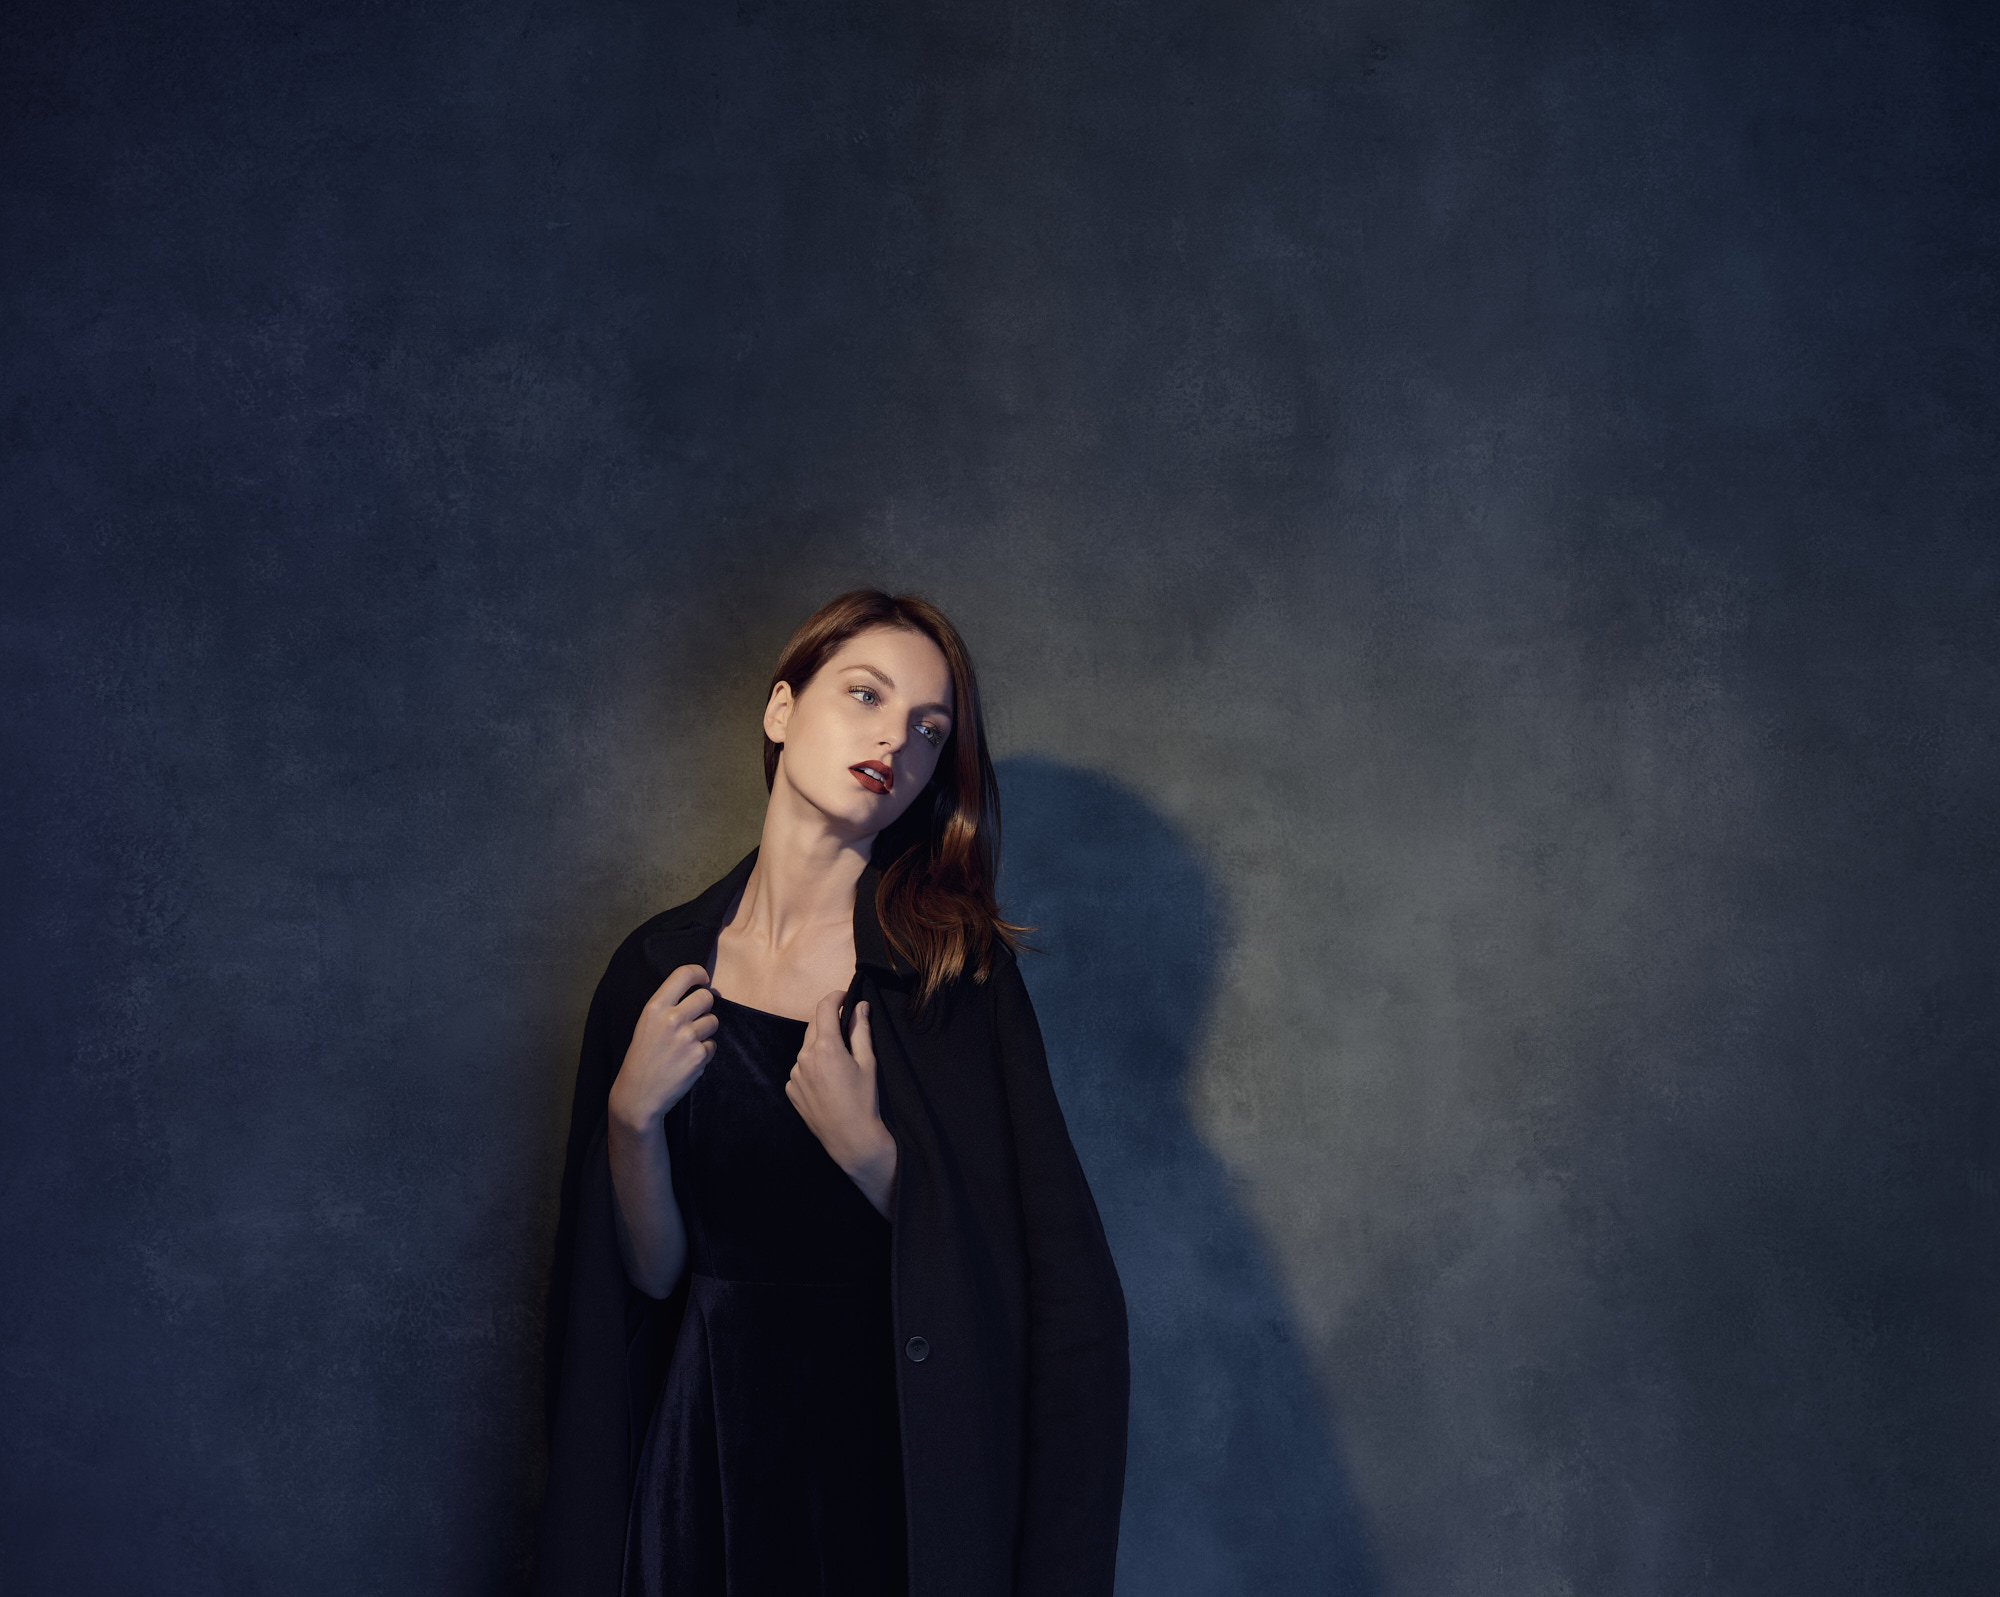 Portrait in studio of Chloé Morgane Vasseur for the art series Seule